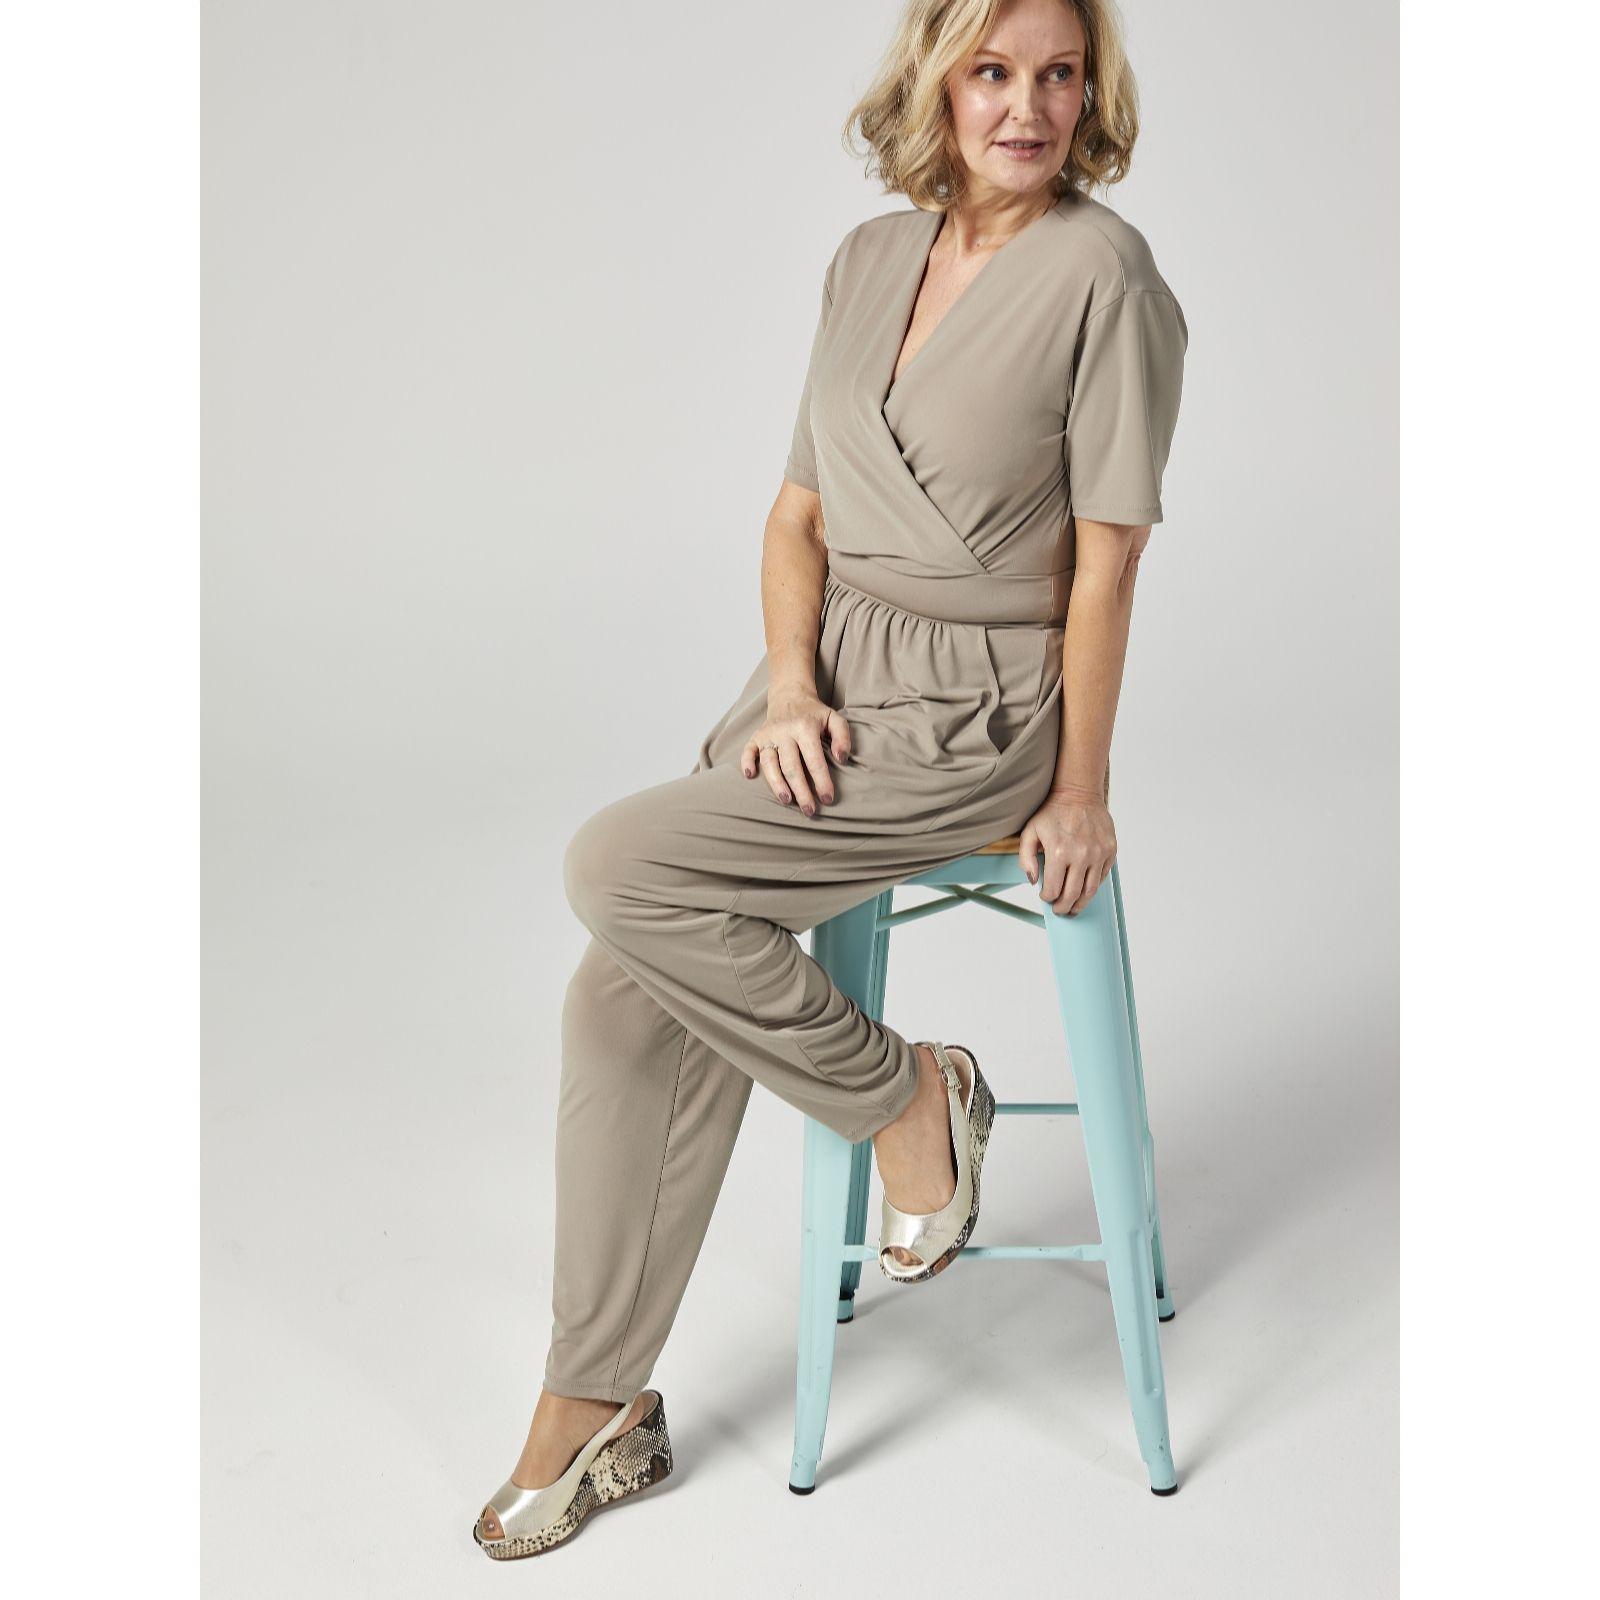 4a3663b2f013 Kim   Co Brazil Jersey Short Sleeve Jumpsuit - Page 1 - QVC UK